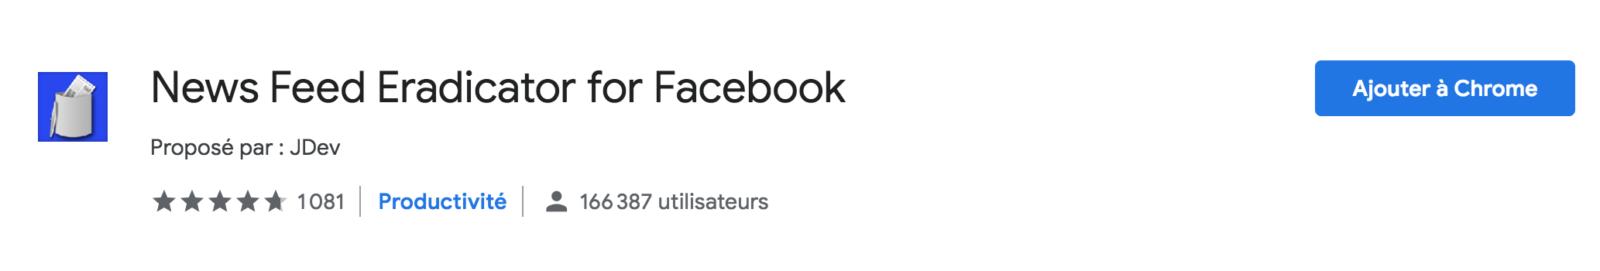 Extension chrome newsfeed eradicator pour Facebook